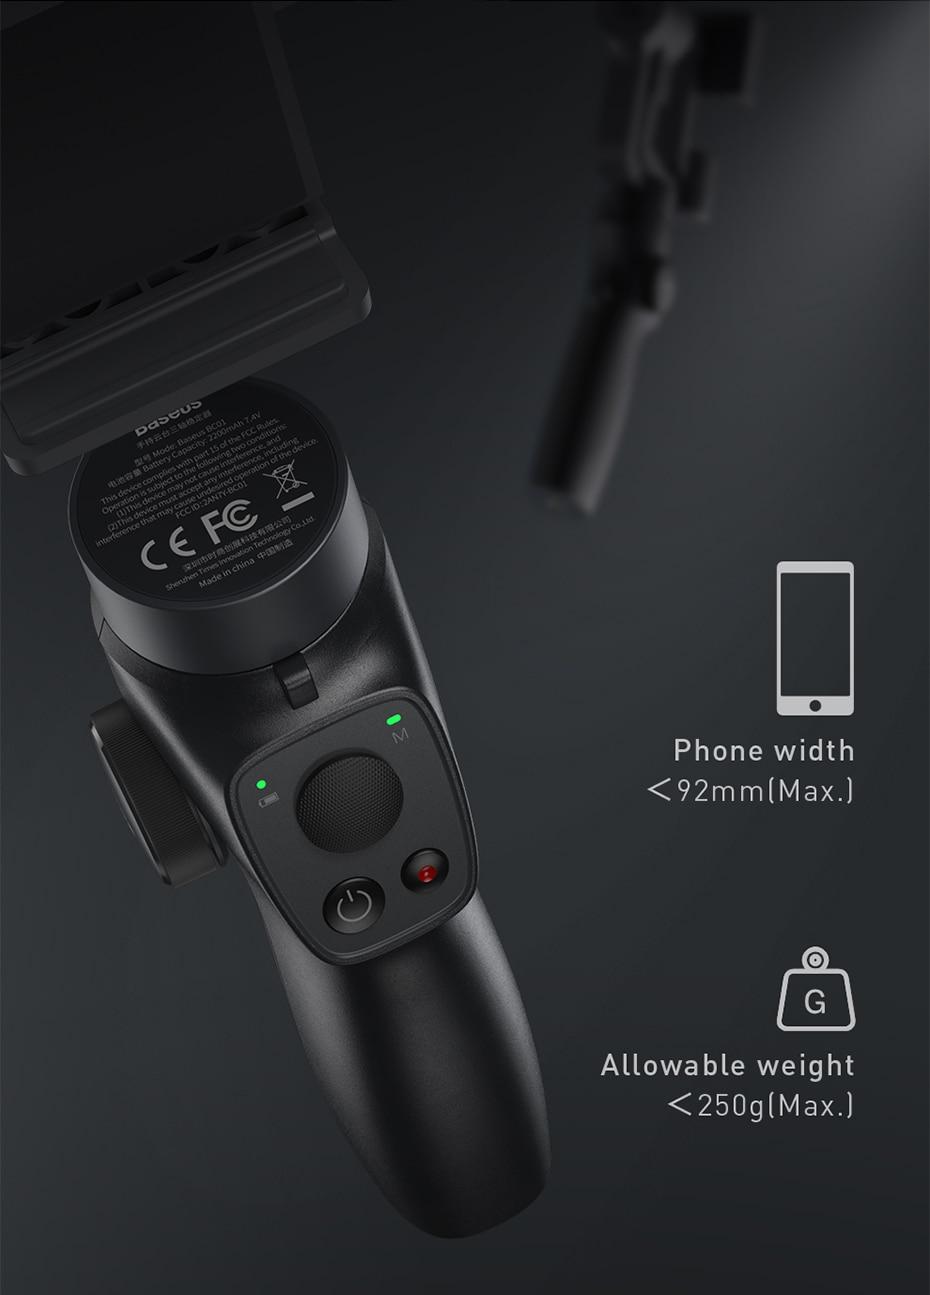 Baseus 3-axis handheld gimbal stabilizer 7